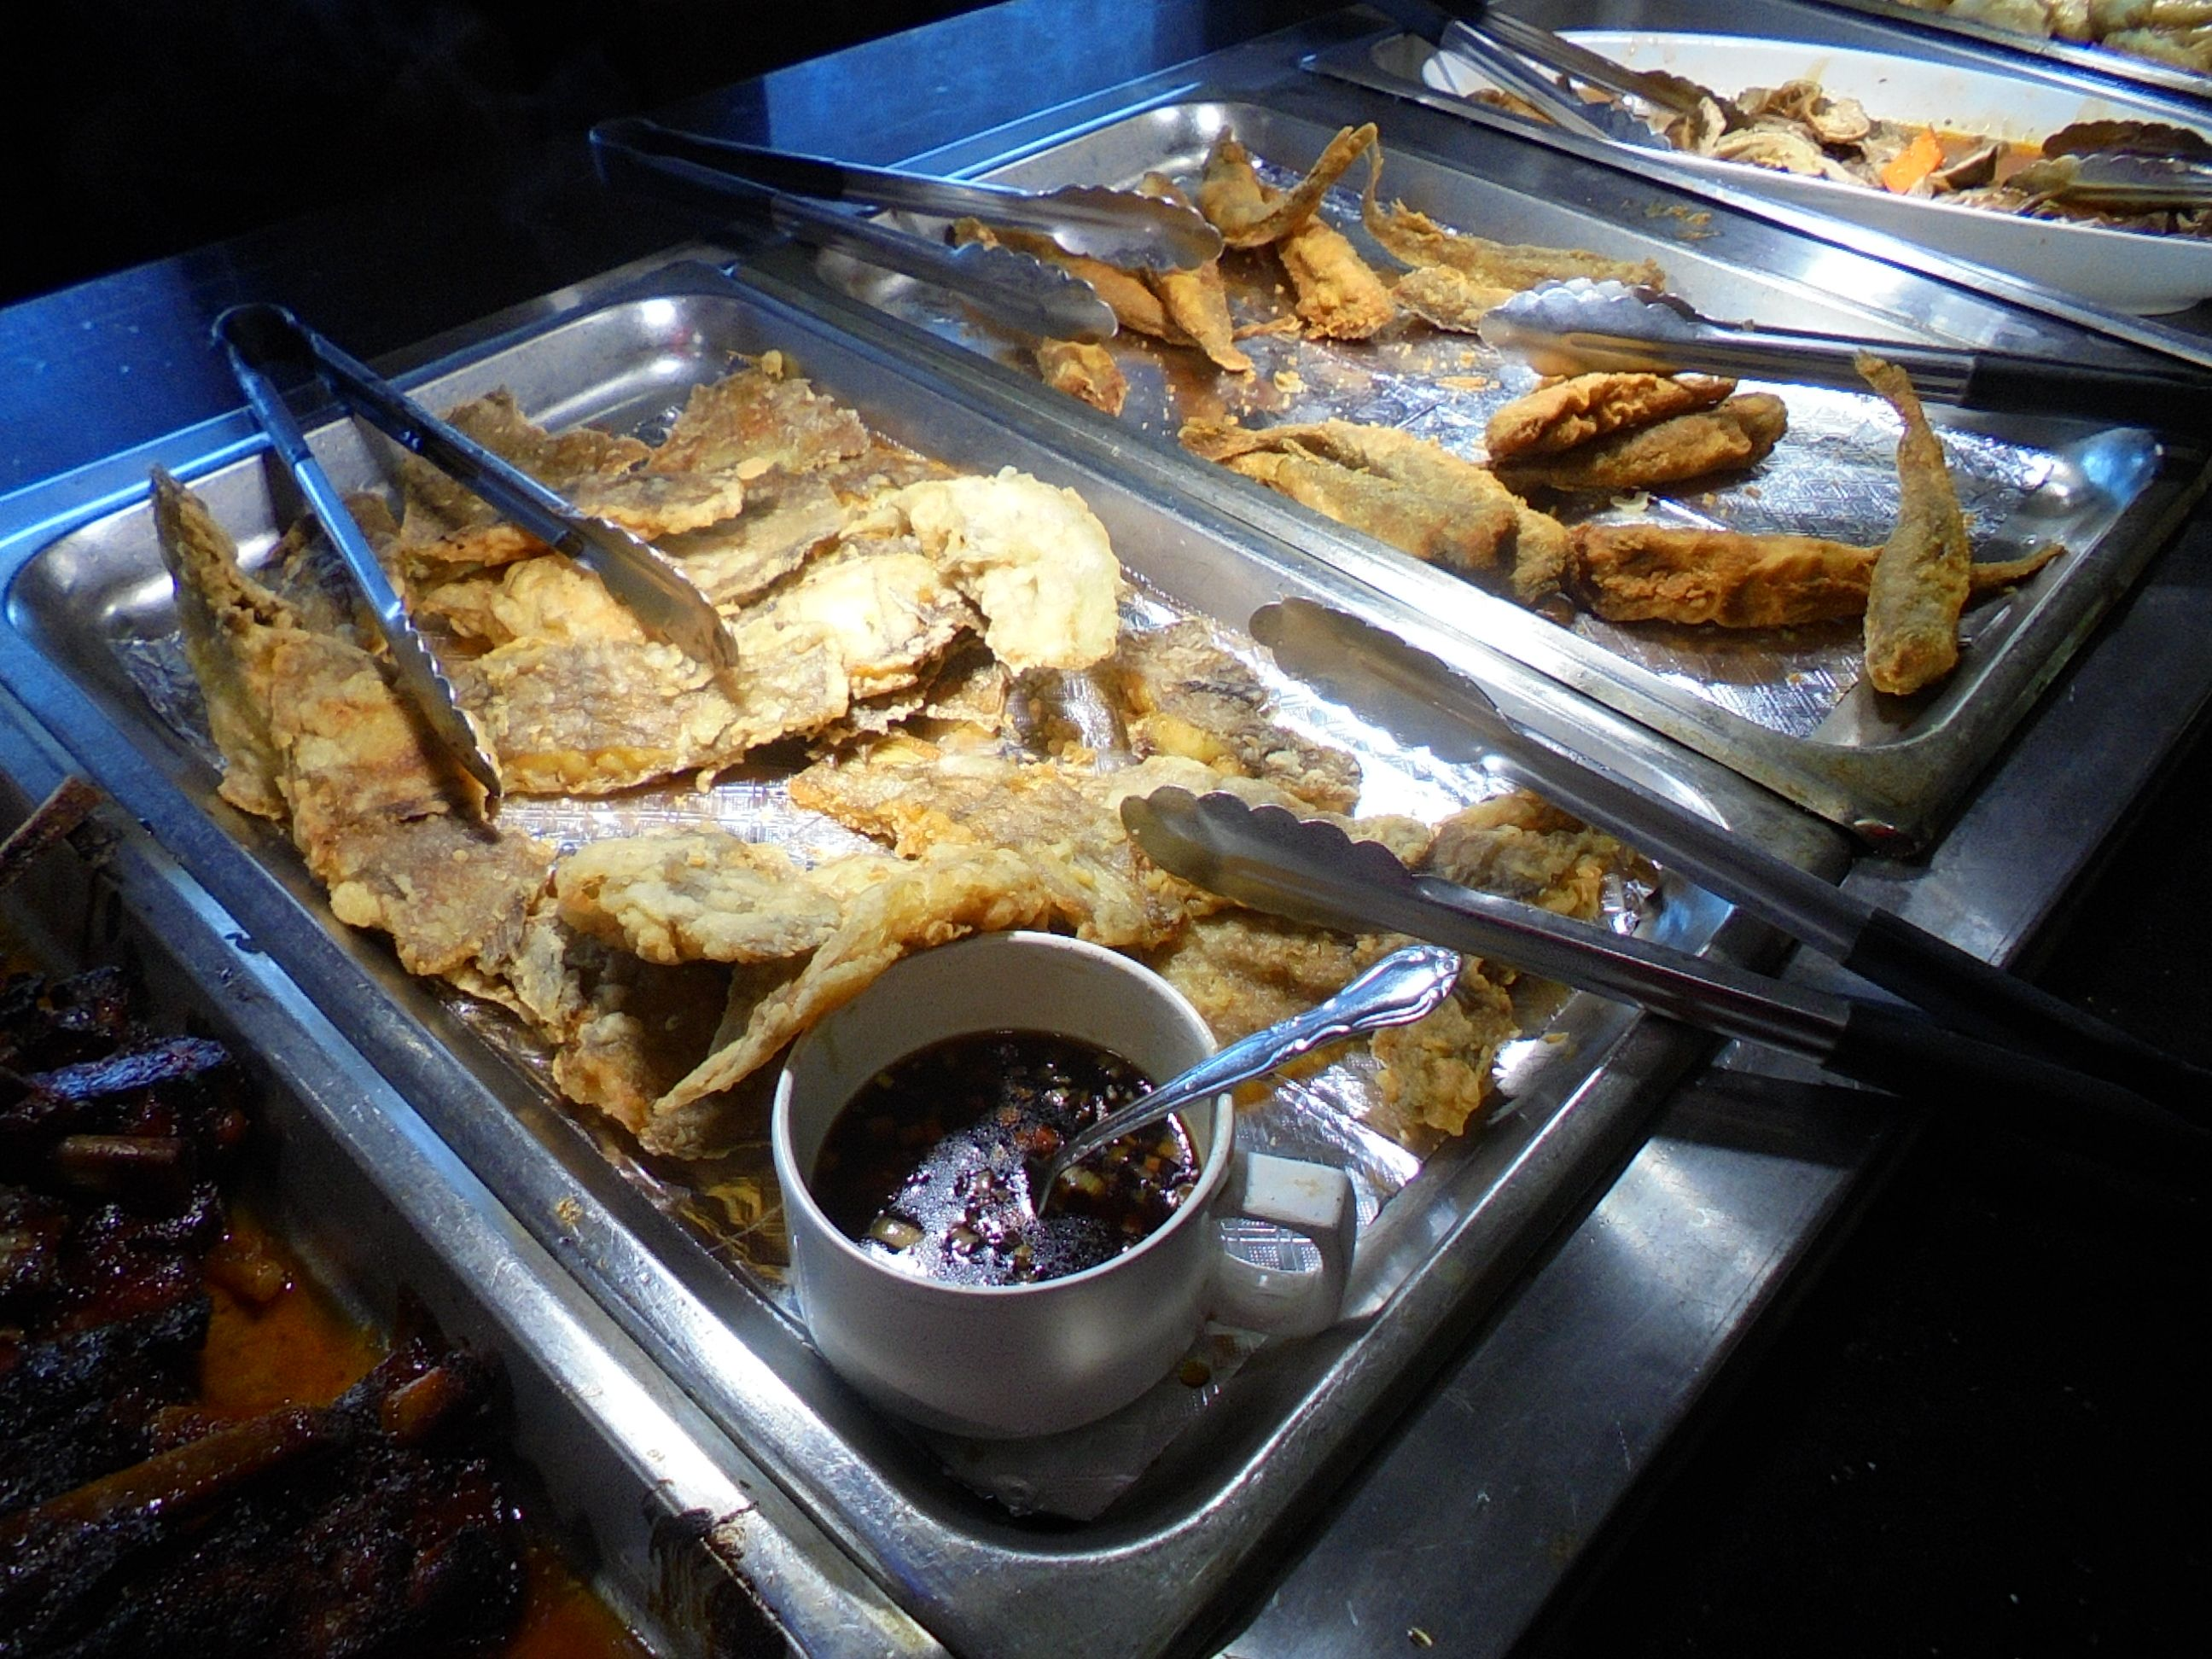 #friedfood - www.drewrynewsnetwork.com/forum/reviews